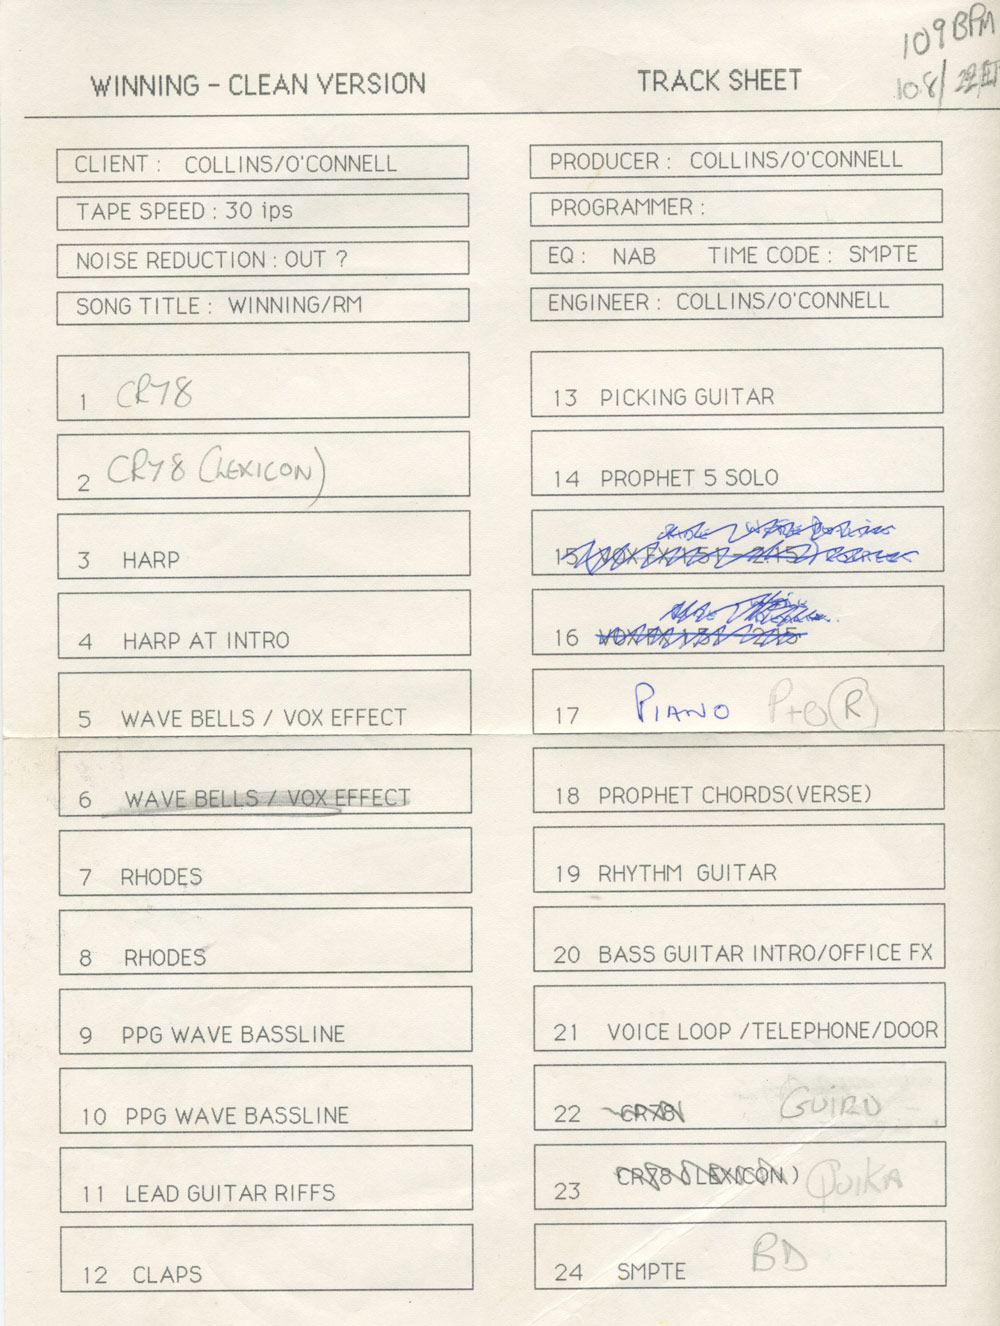 track-sheet